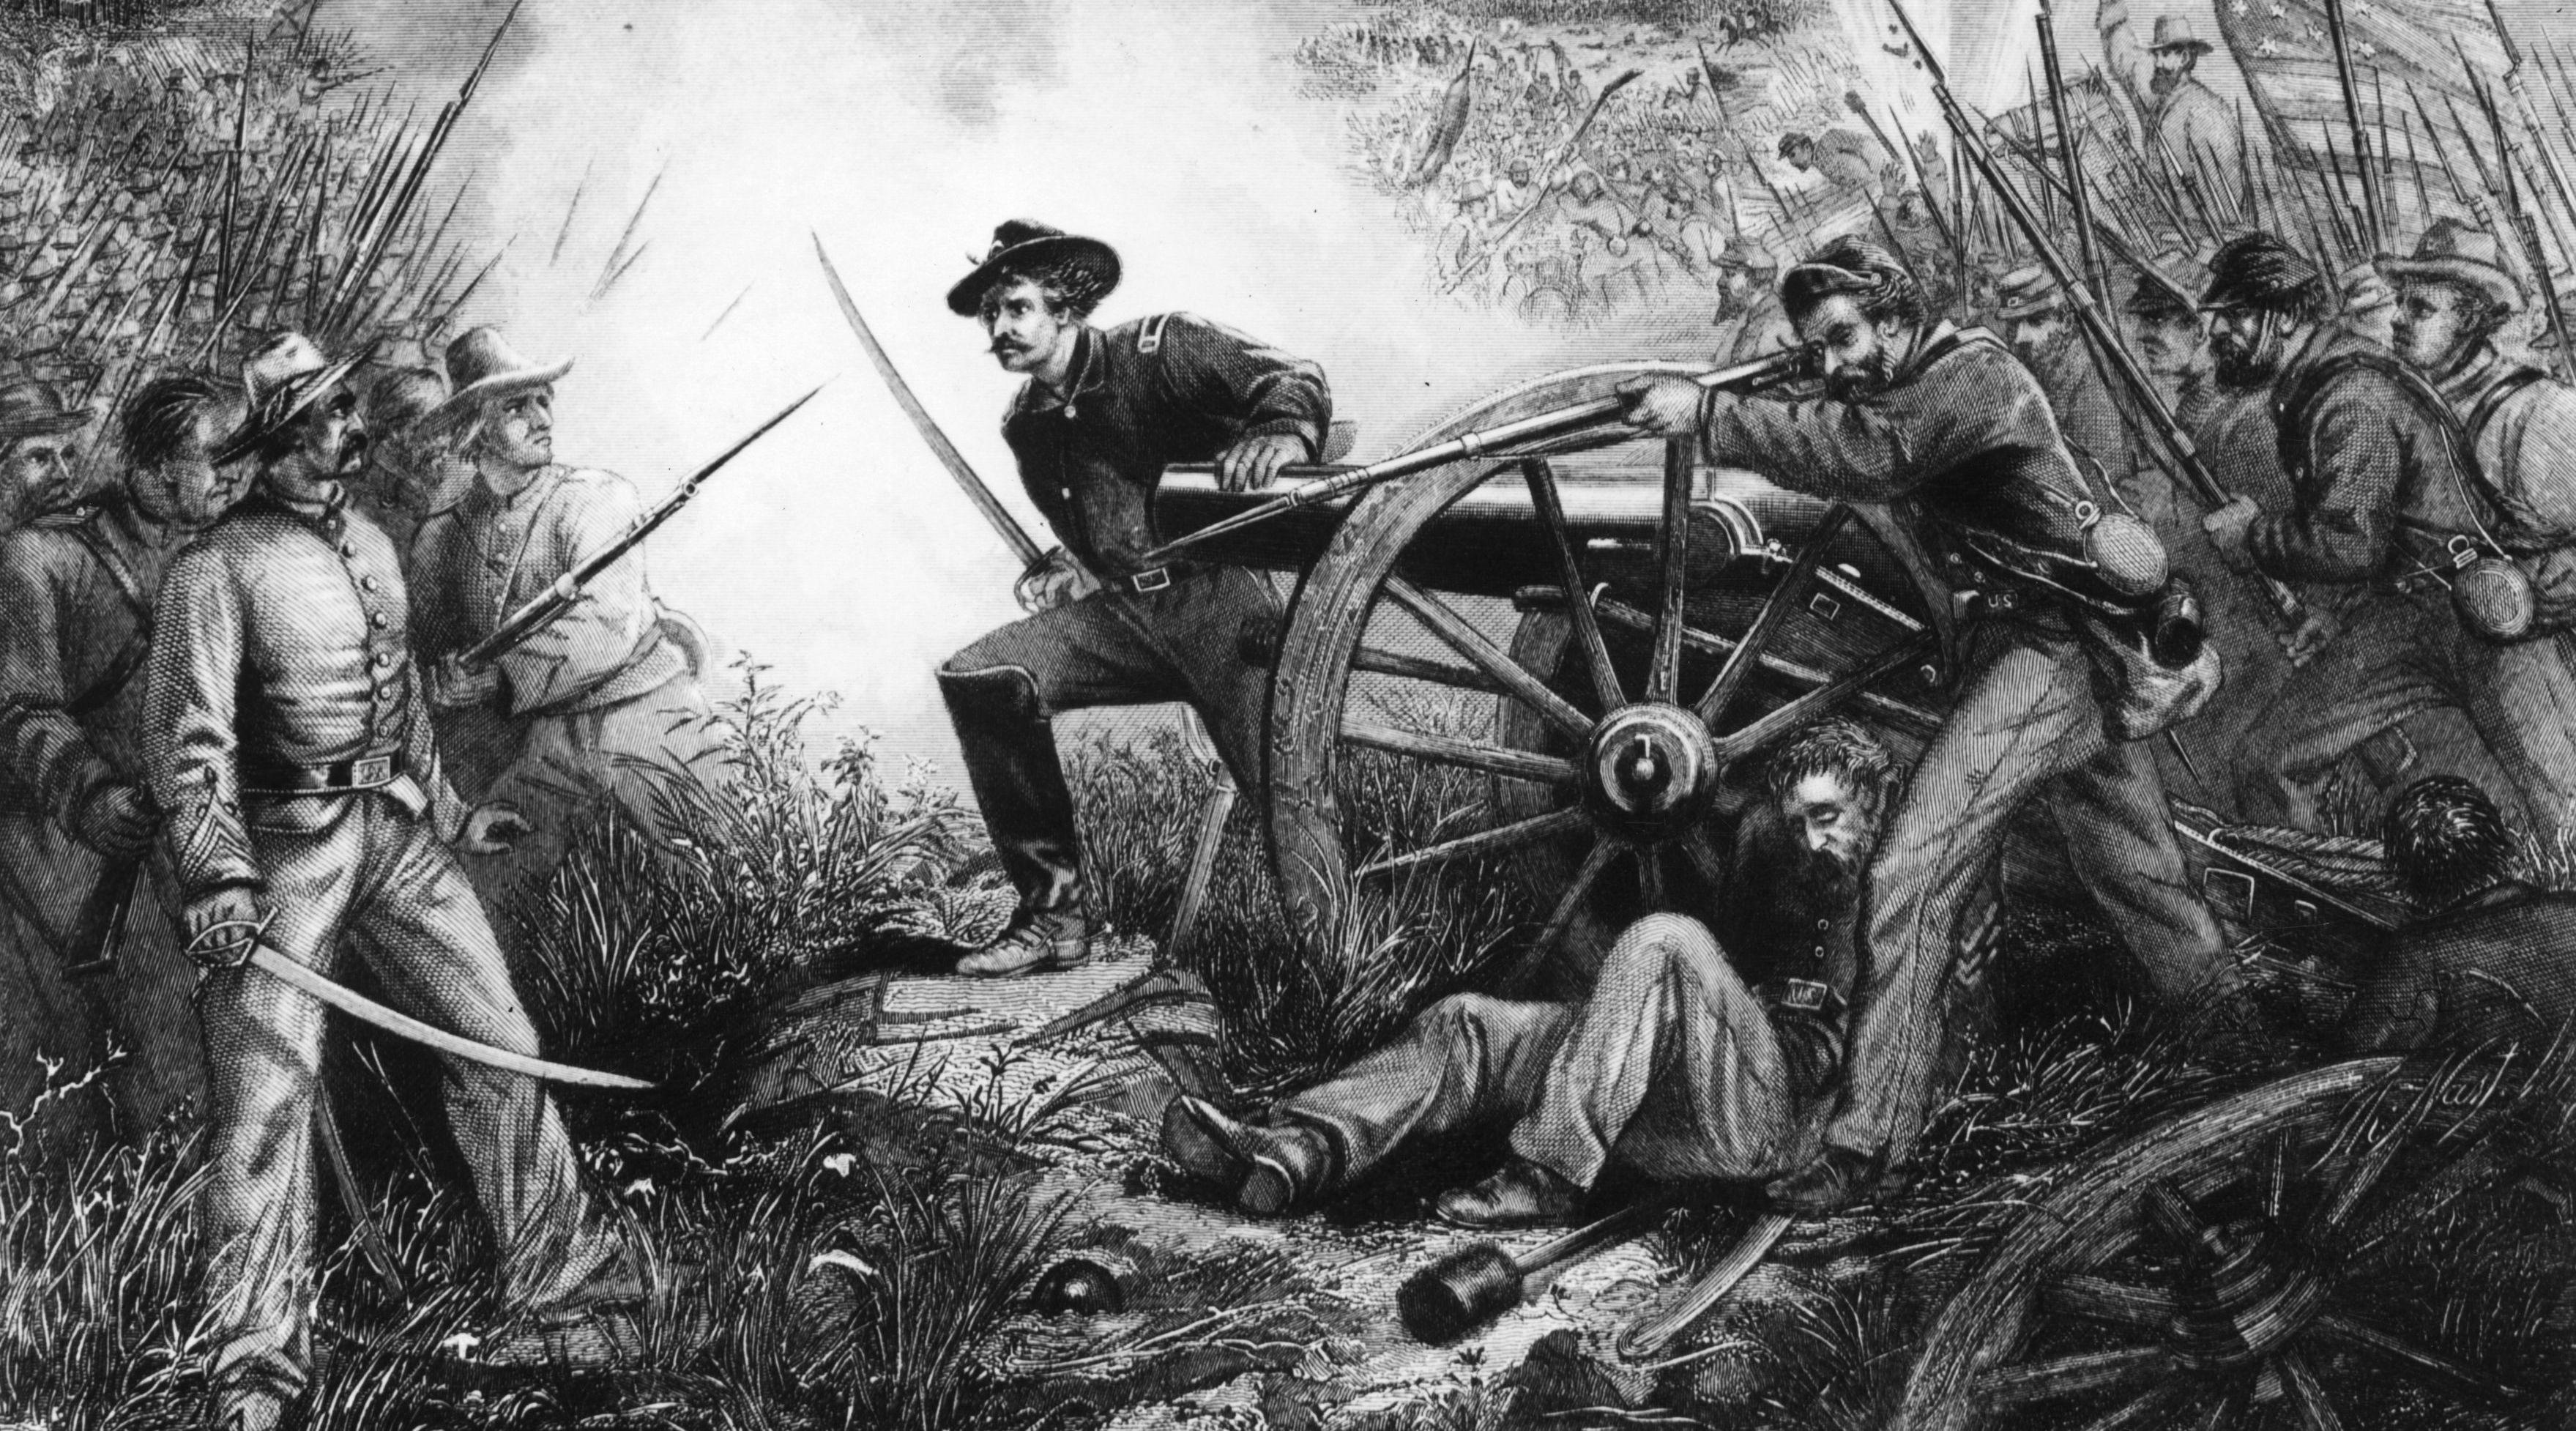 Lt. Van Pelt defending his battery in the battle of Chickamauga during the American Civil War